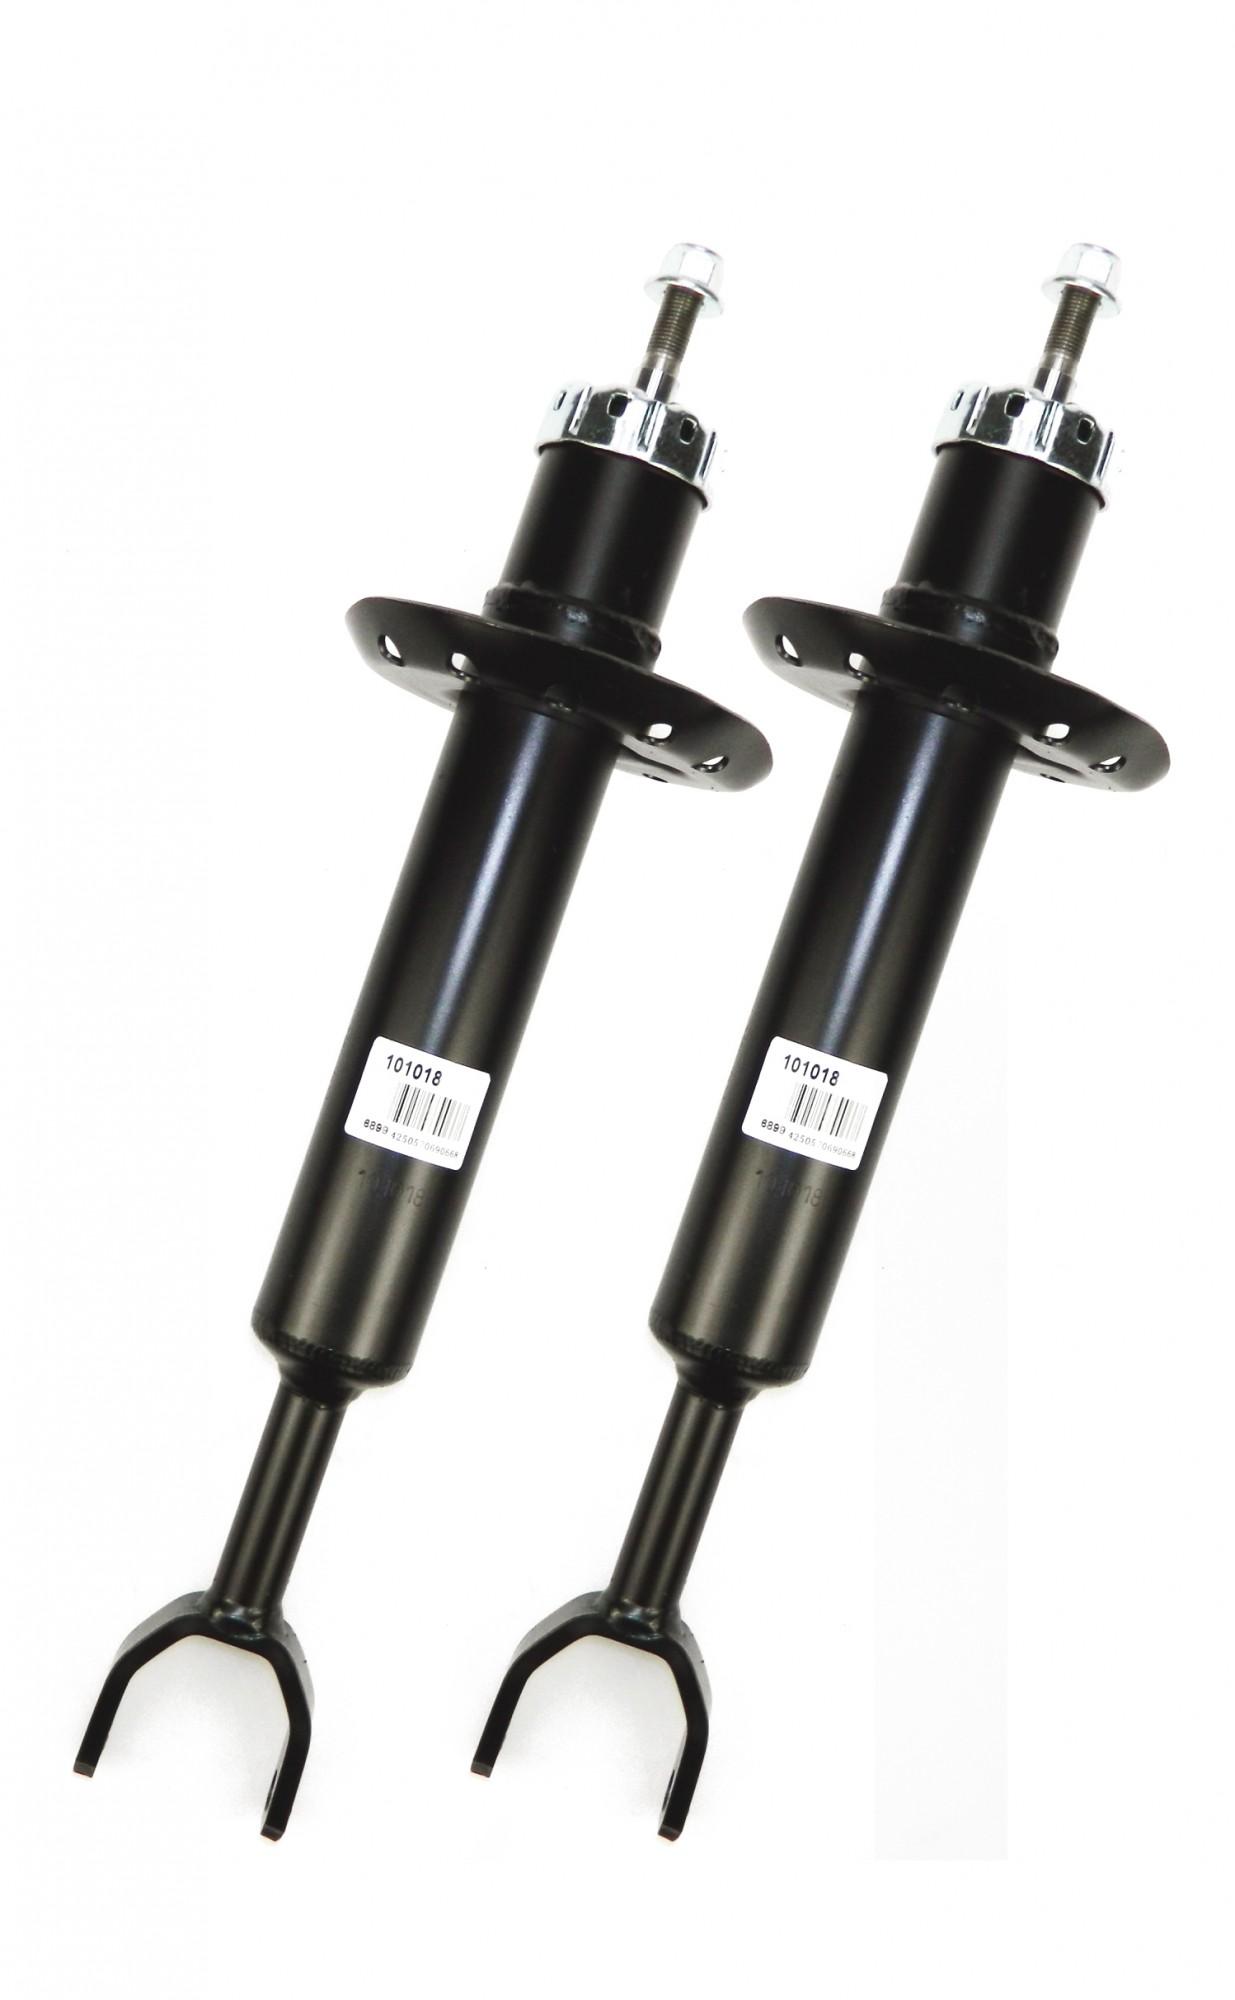 2 Gasfedern Audi A6 Avant 4B C5 1.8 1.9TDI 2.4 2.5TDi 2.7T 2.8 3.7 4.2 S6 RS6